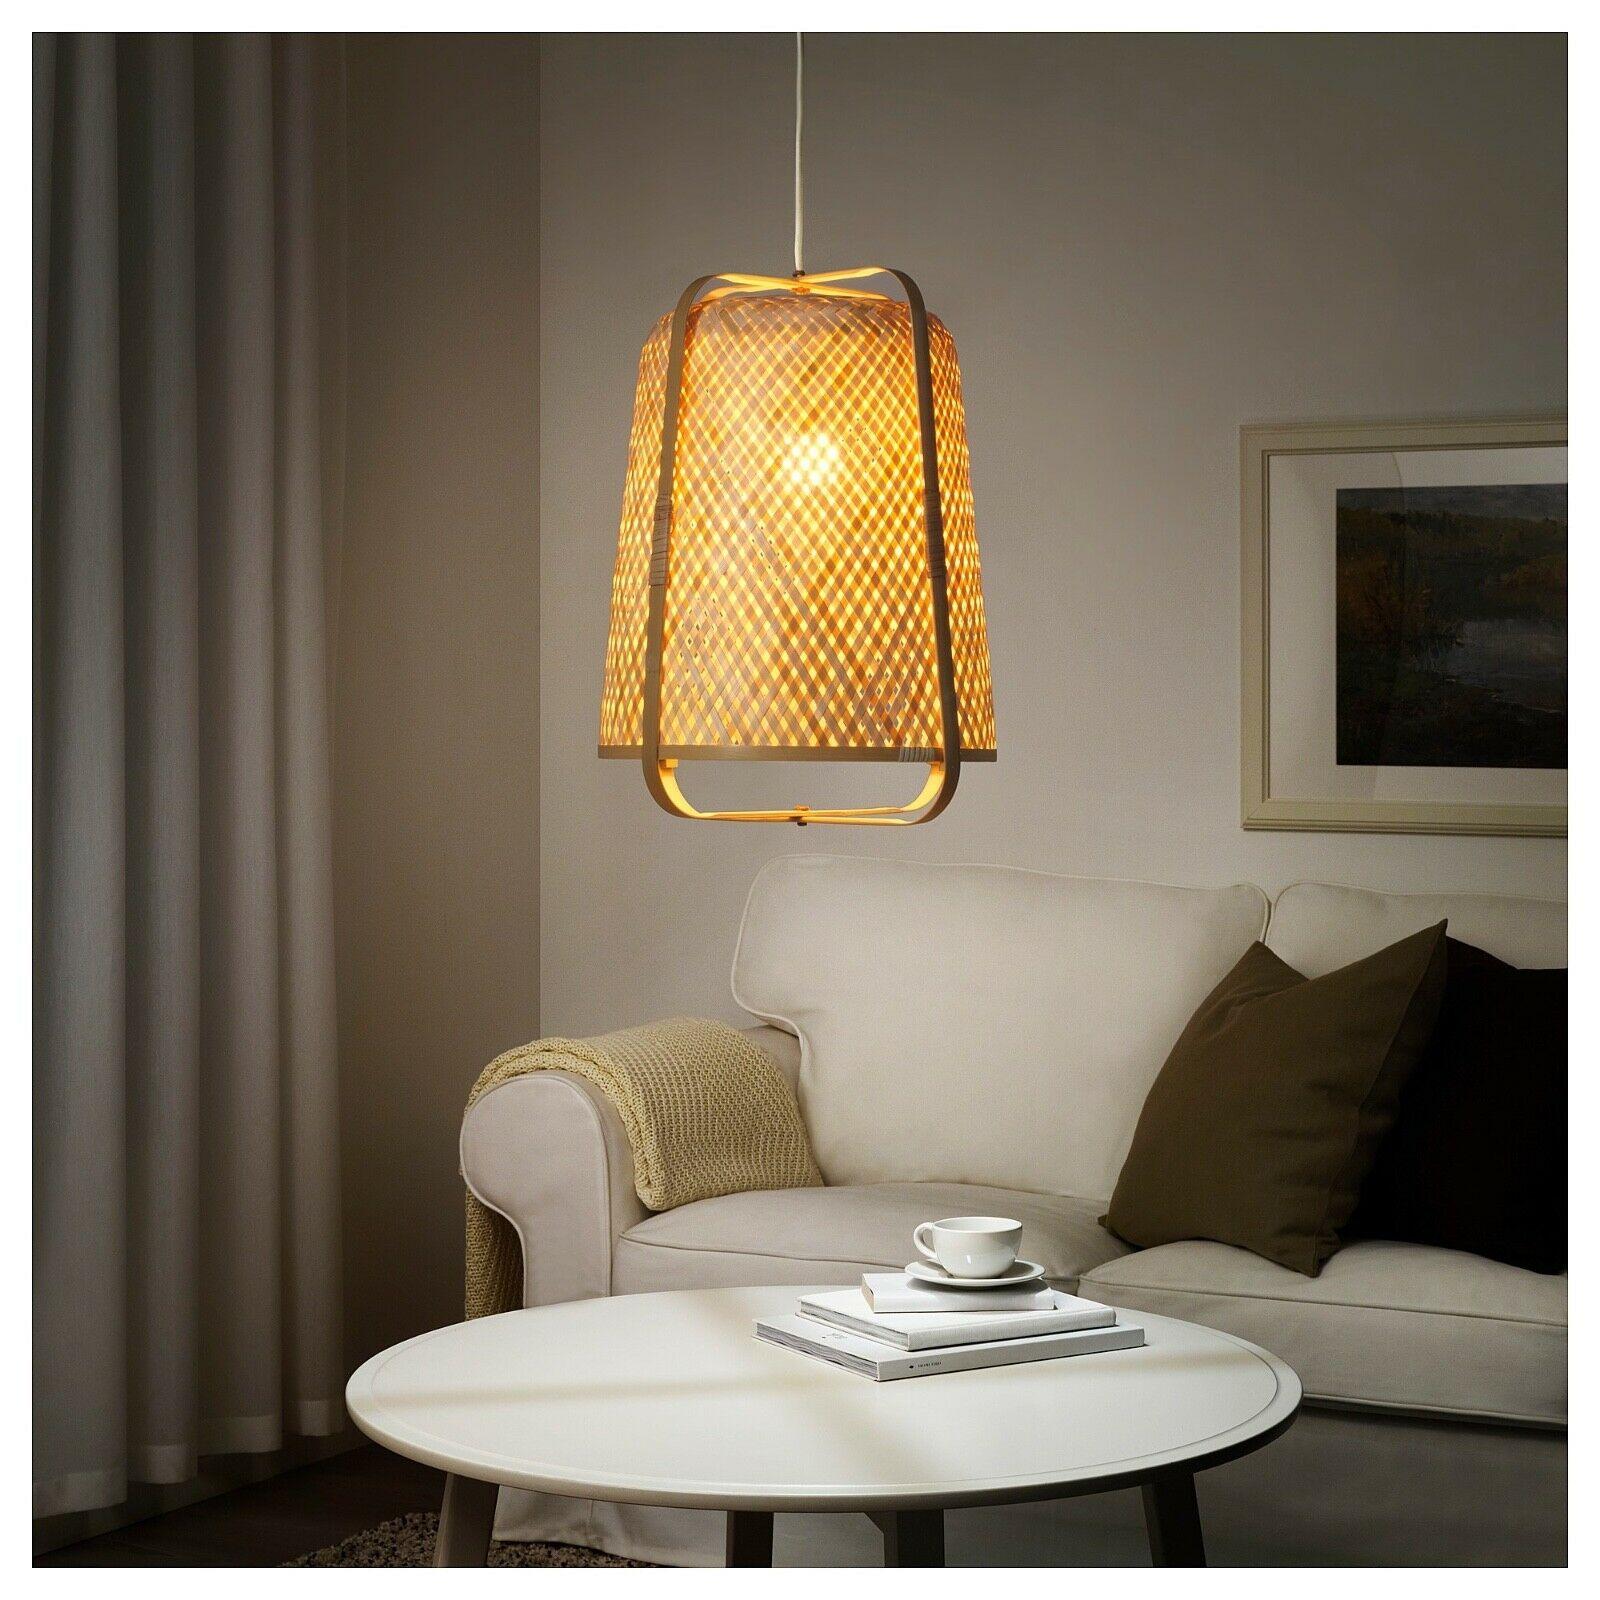 "IKEA KNIXHULT Pendant lamp 21"", Bamboo, 604.071.34 - BRAND NEW"